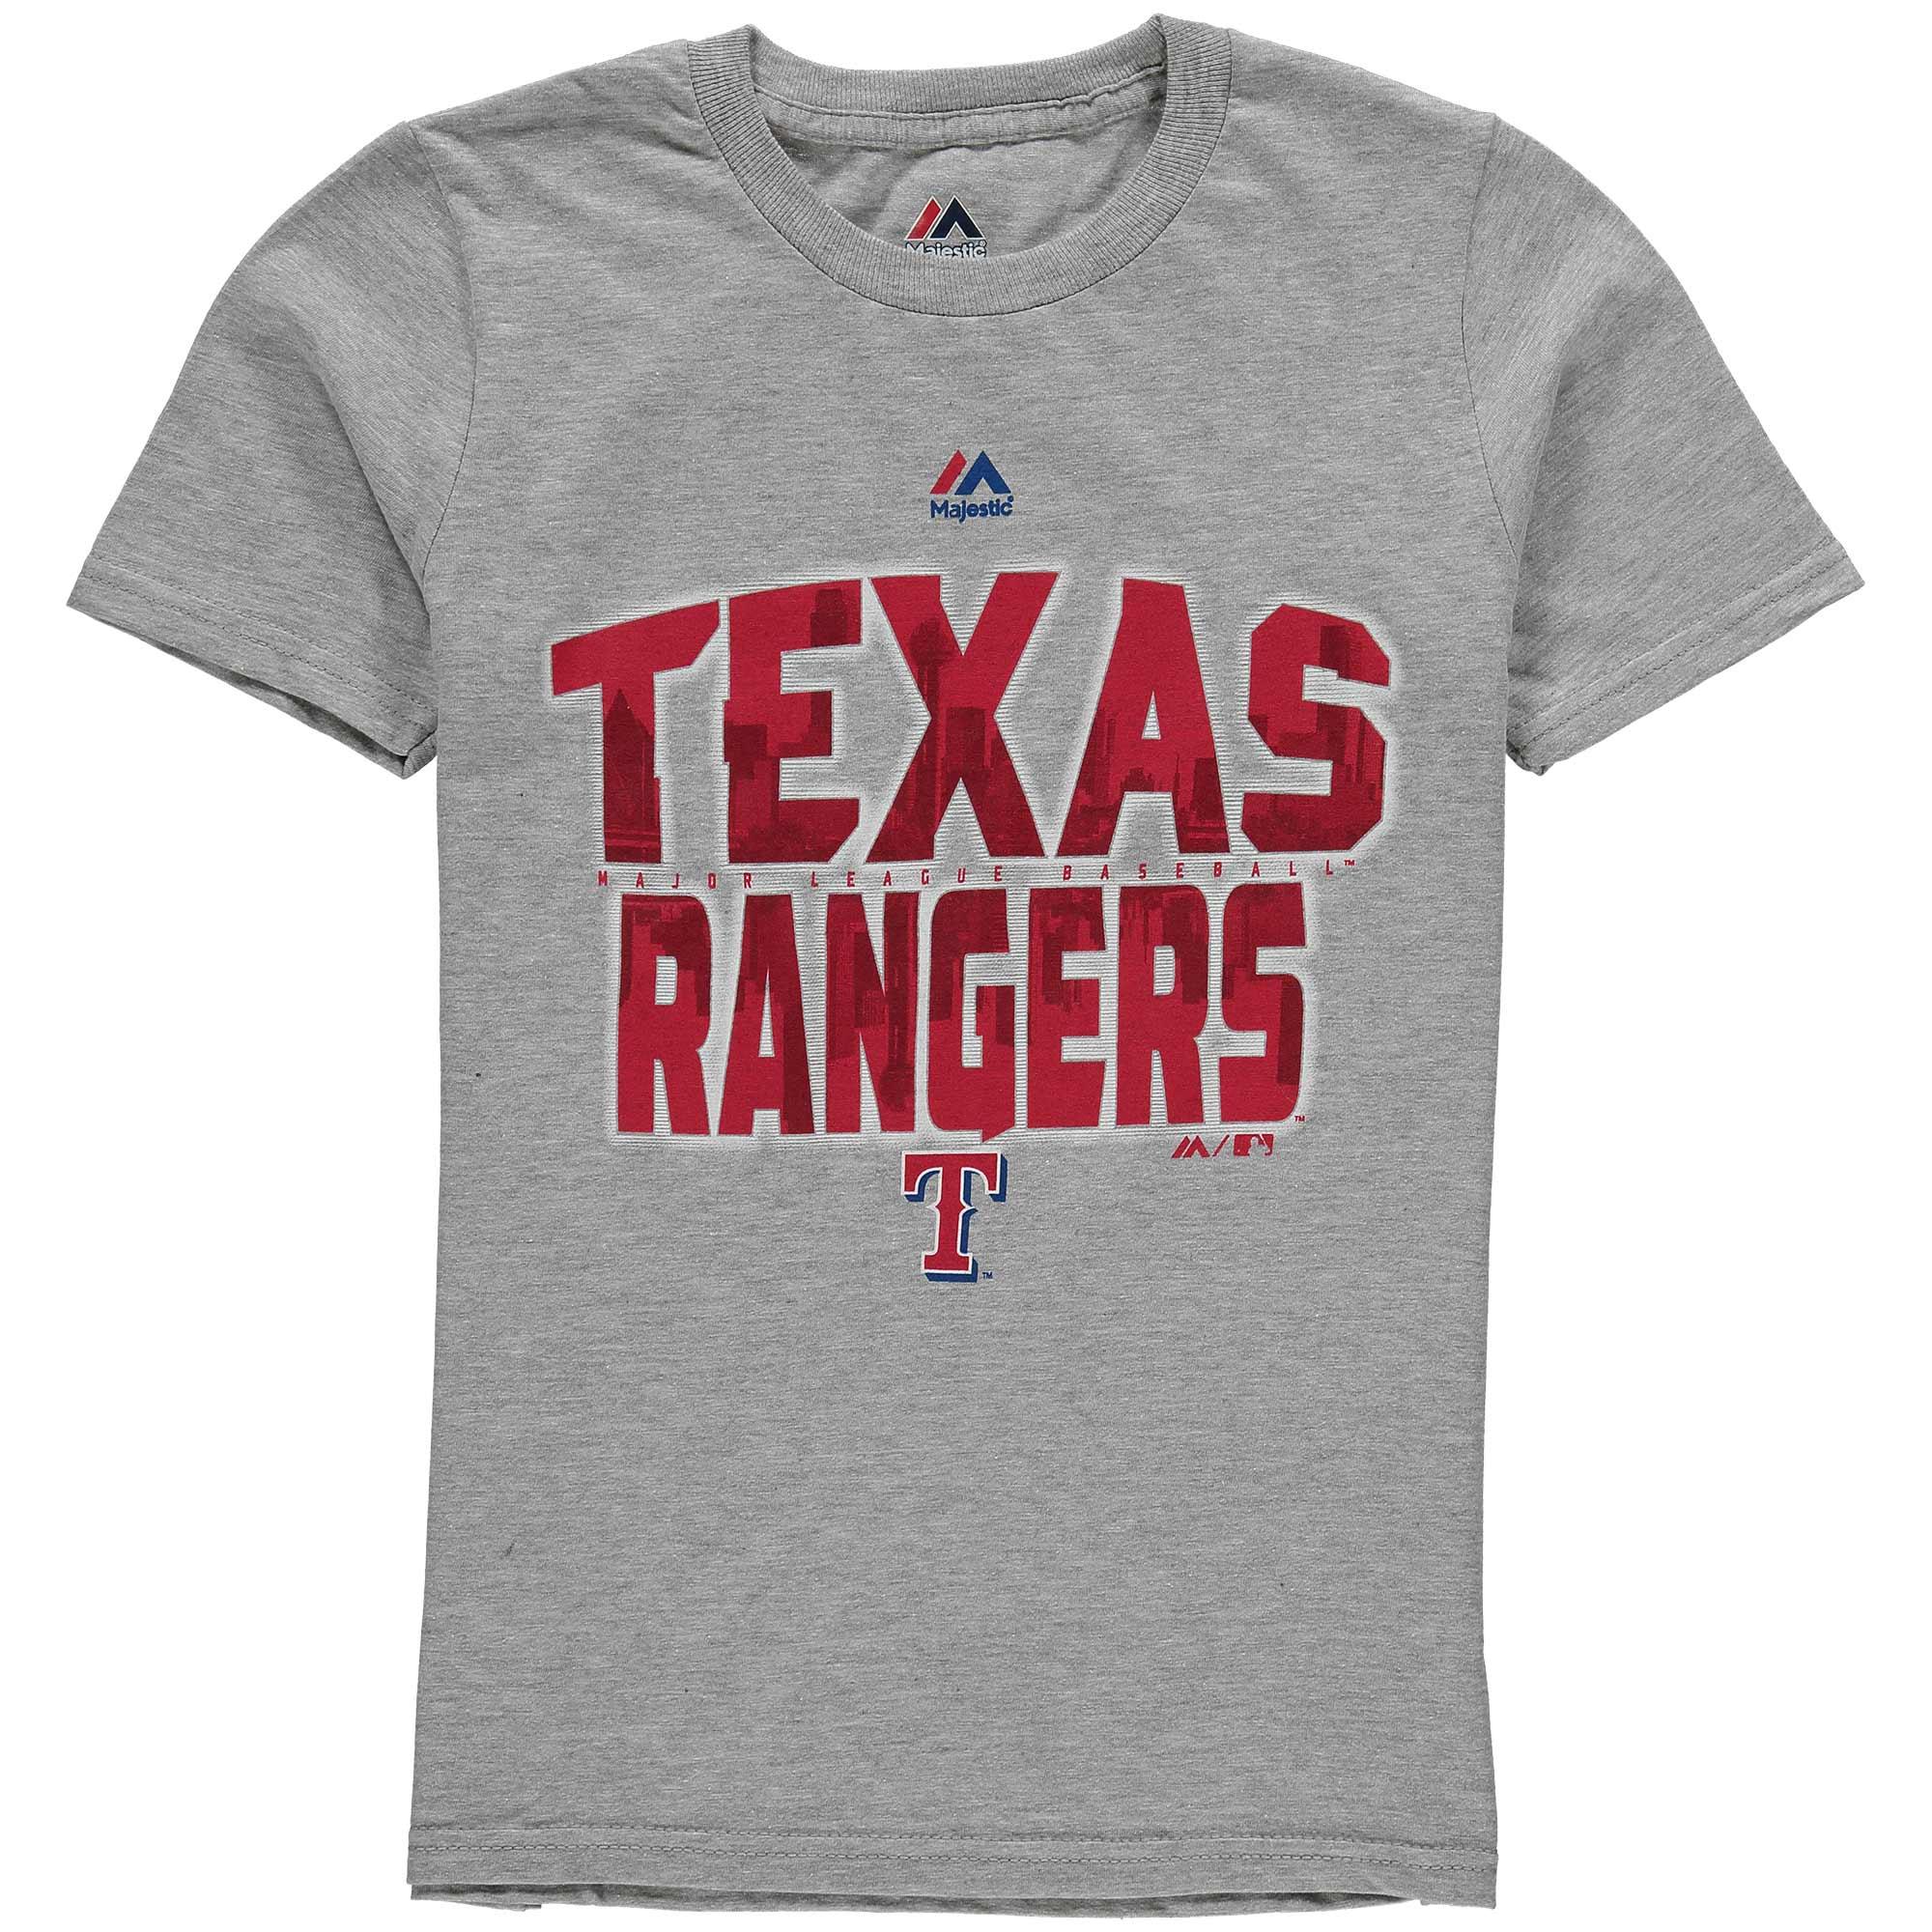 Texas Rangers Majestic Youth Big City T-Shirt - Gray